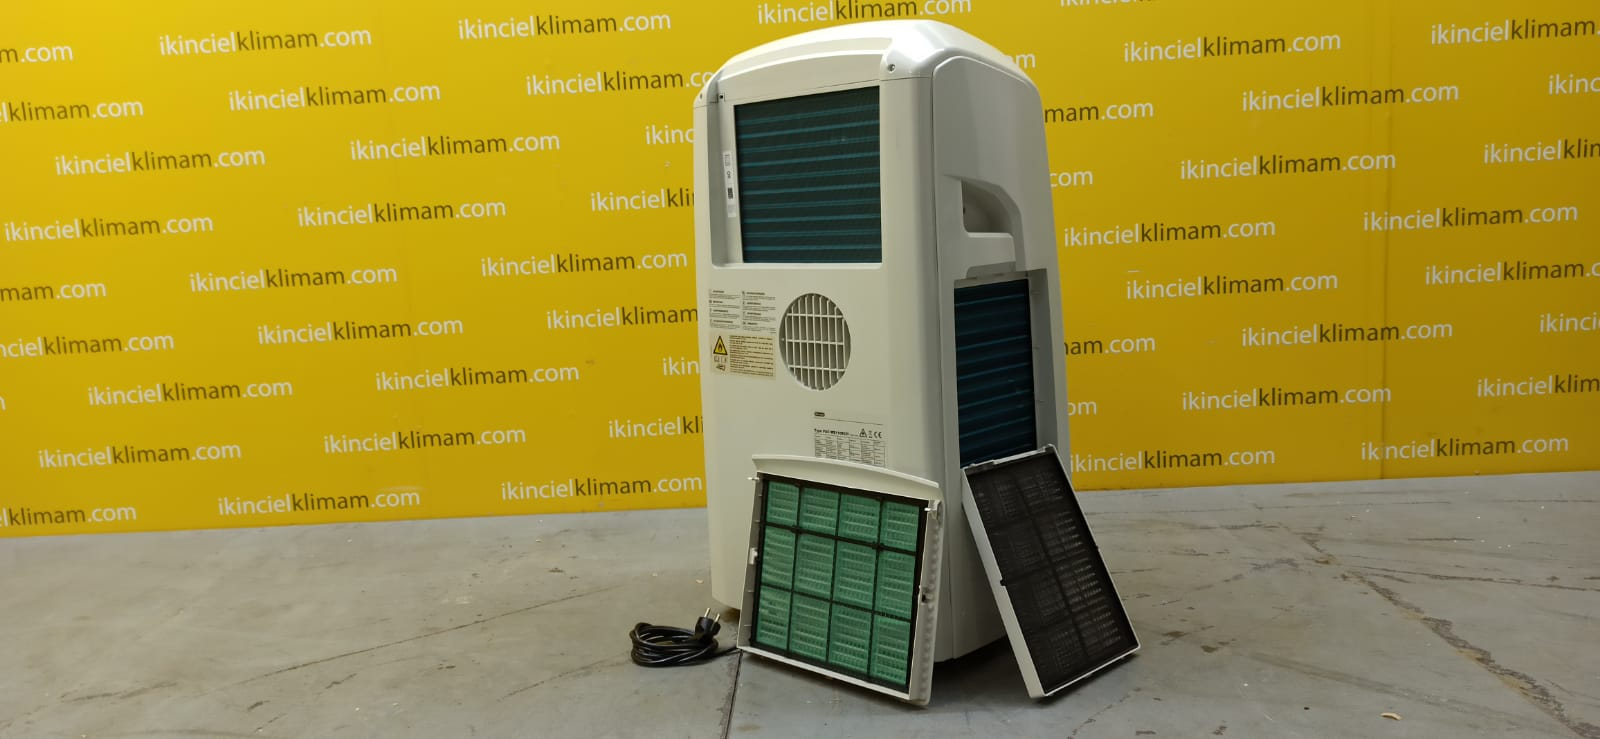 DELONGI PAC WE110ECO Pinguino ( Sadece Soğutma ) A Enerji Sınıfı 11000 BTU On-Off  Mobil Portatif Klima